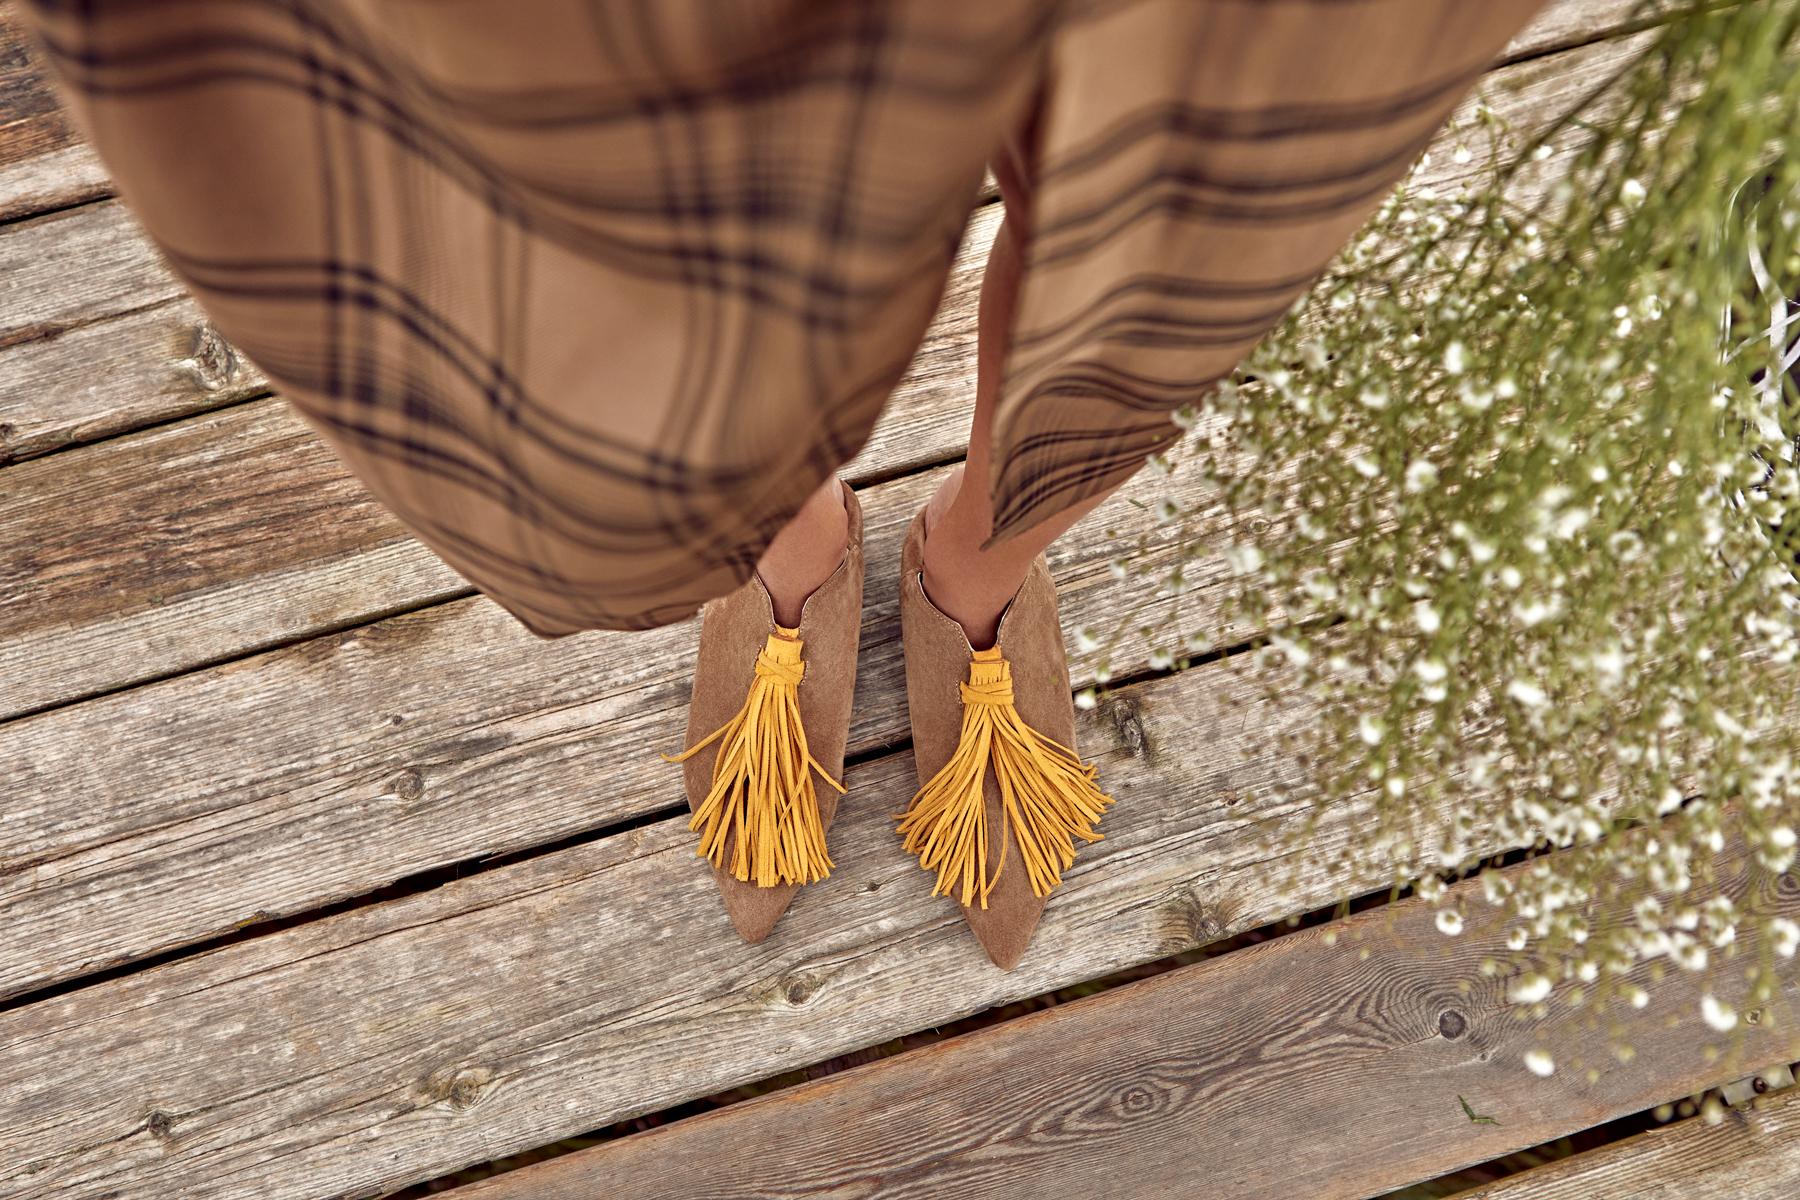 maray_shoes__fashion-makersIMG_8687.jpg